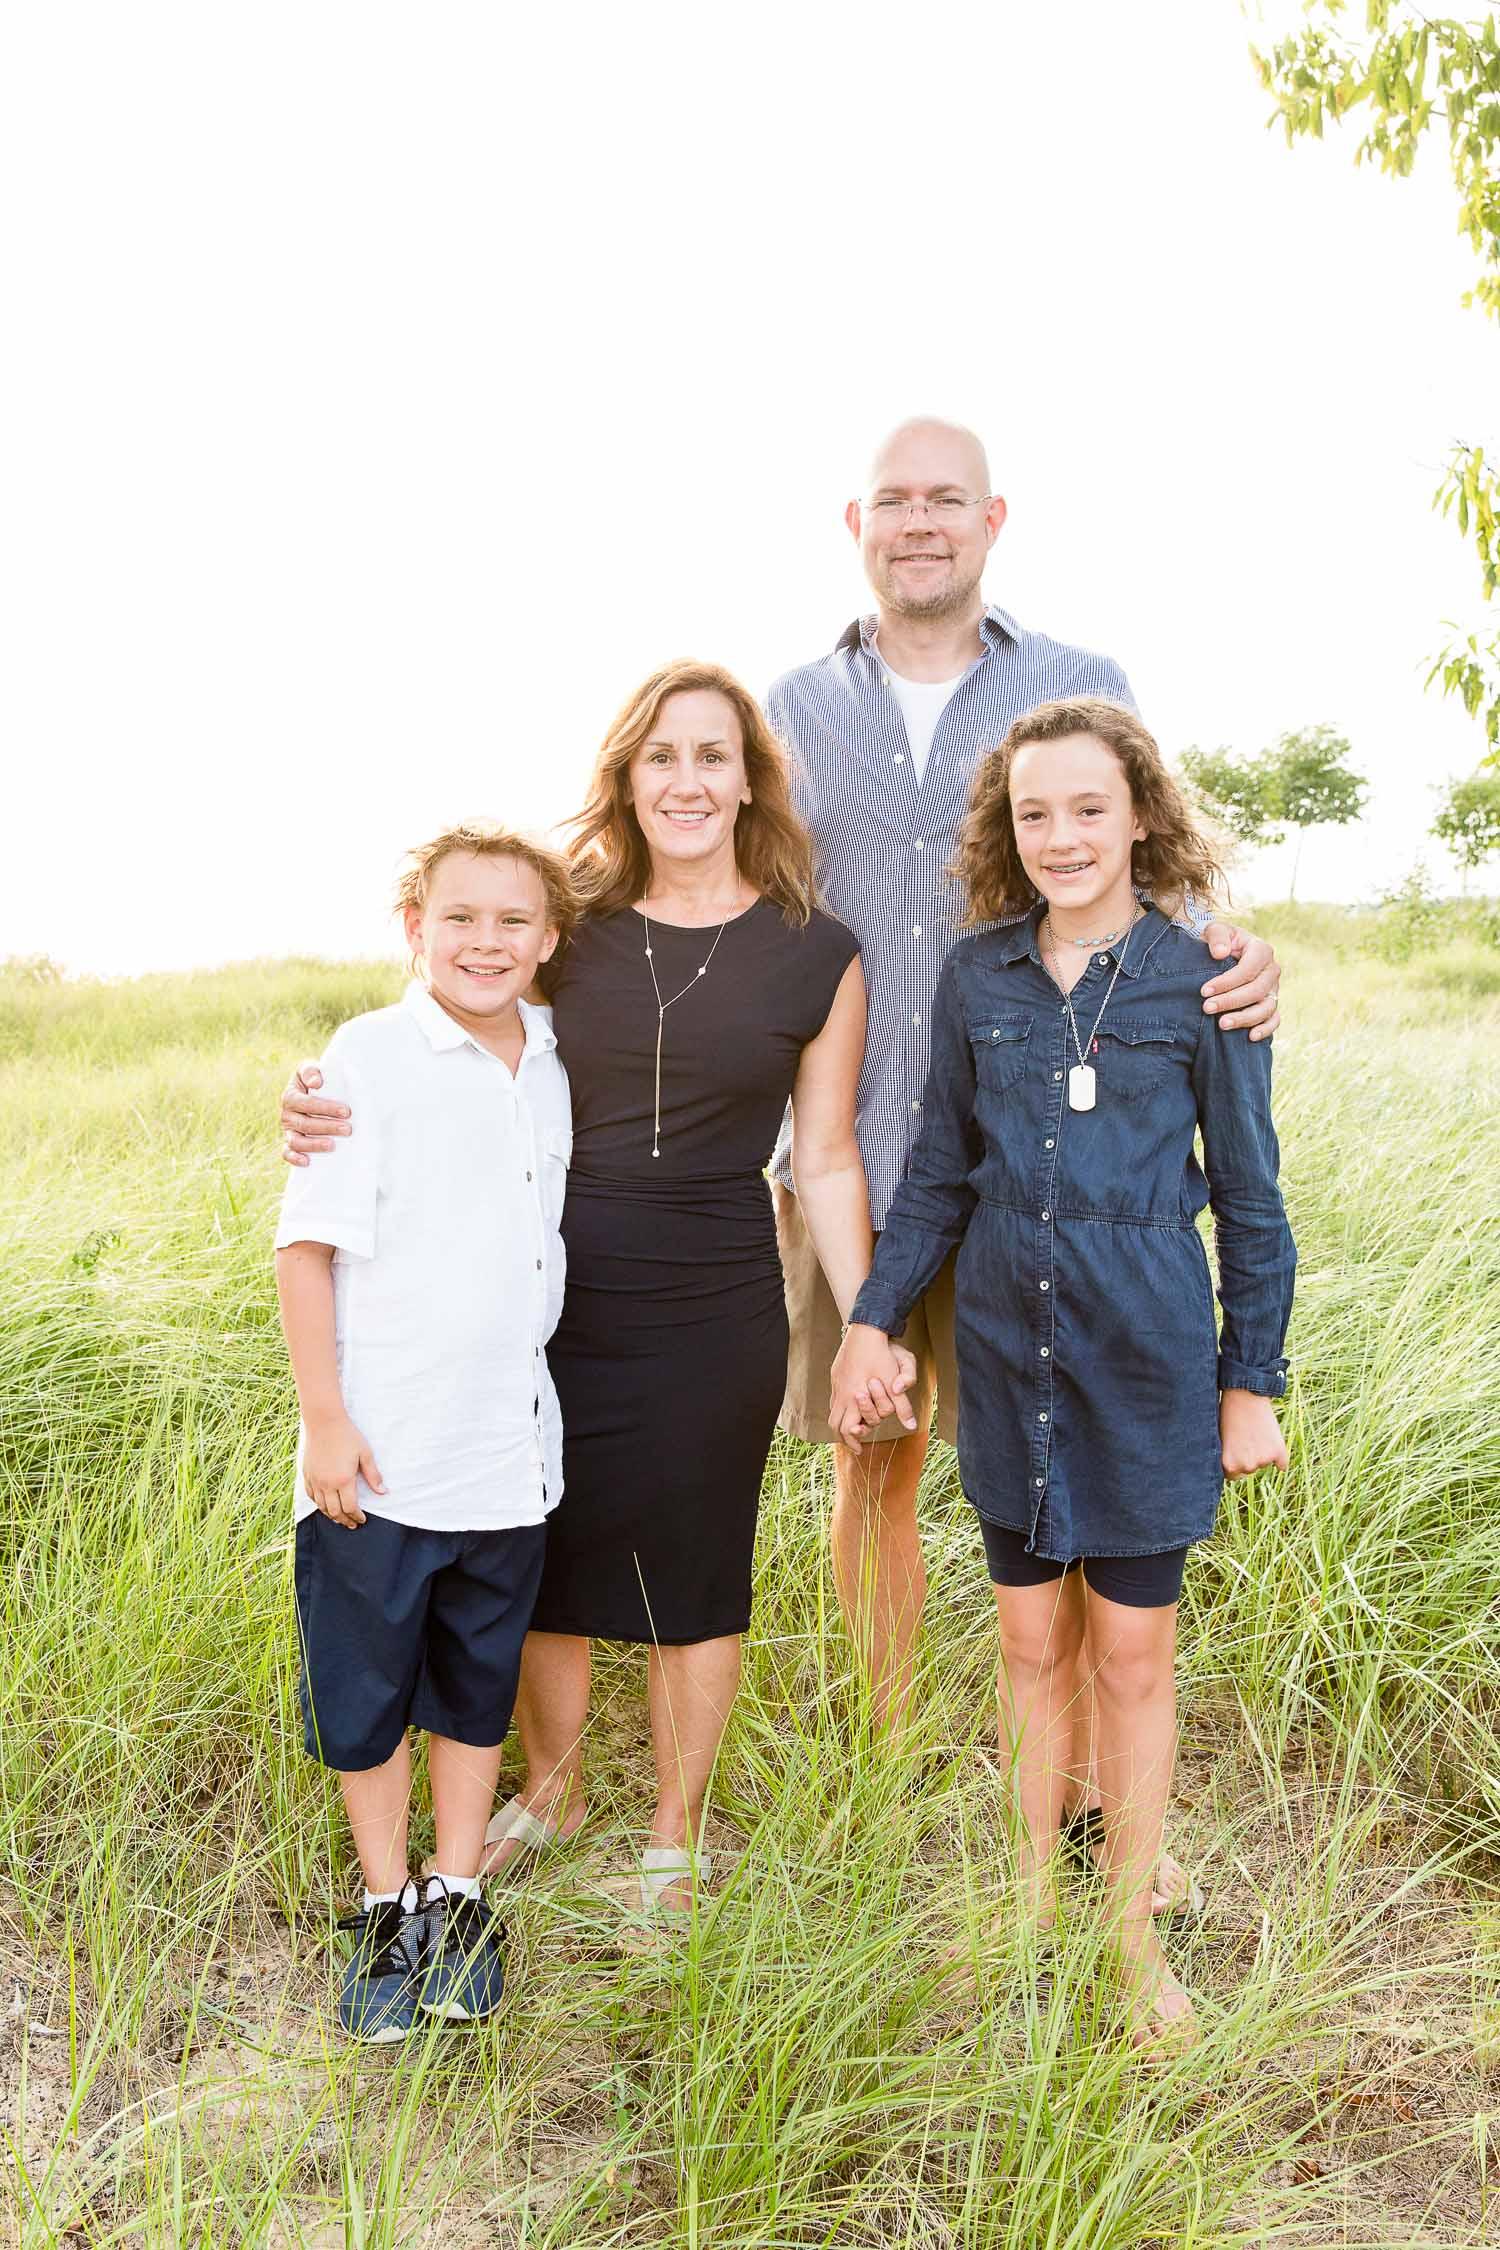 Smith-family-2018-55-ss.jpg